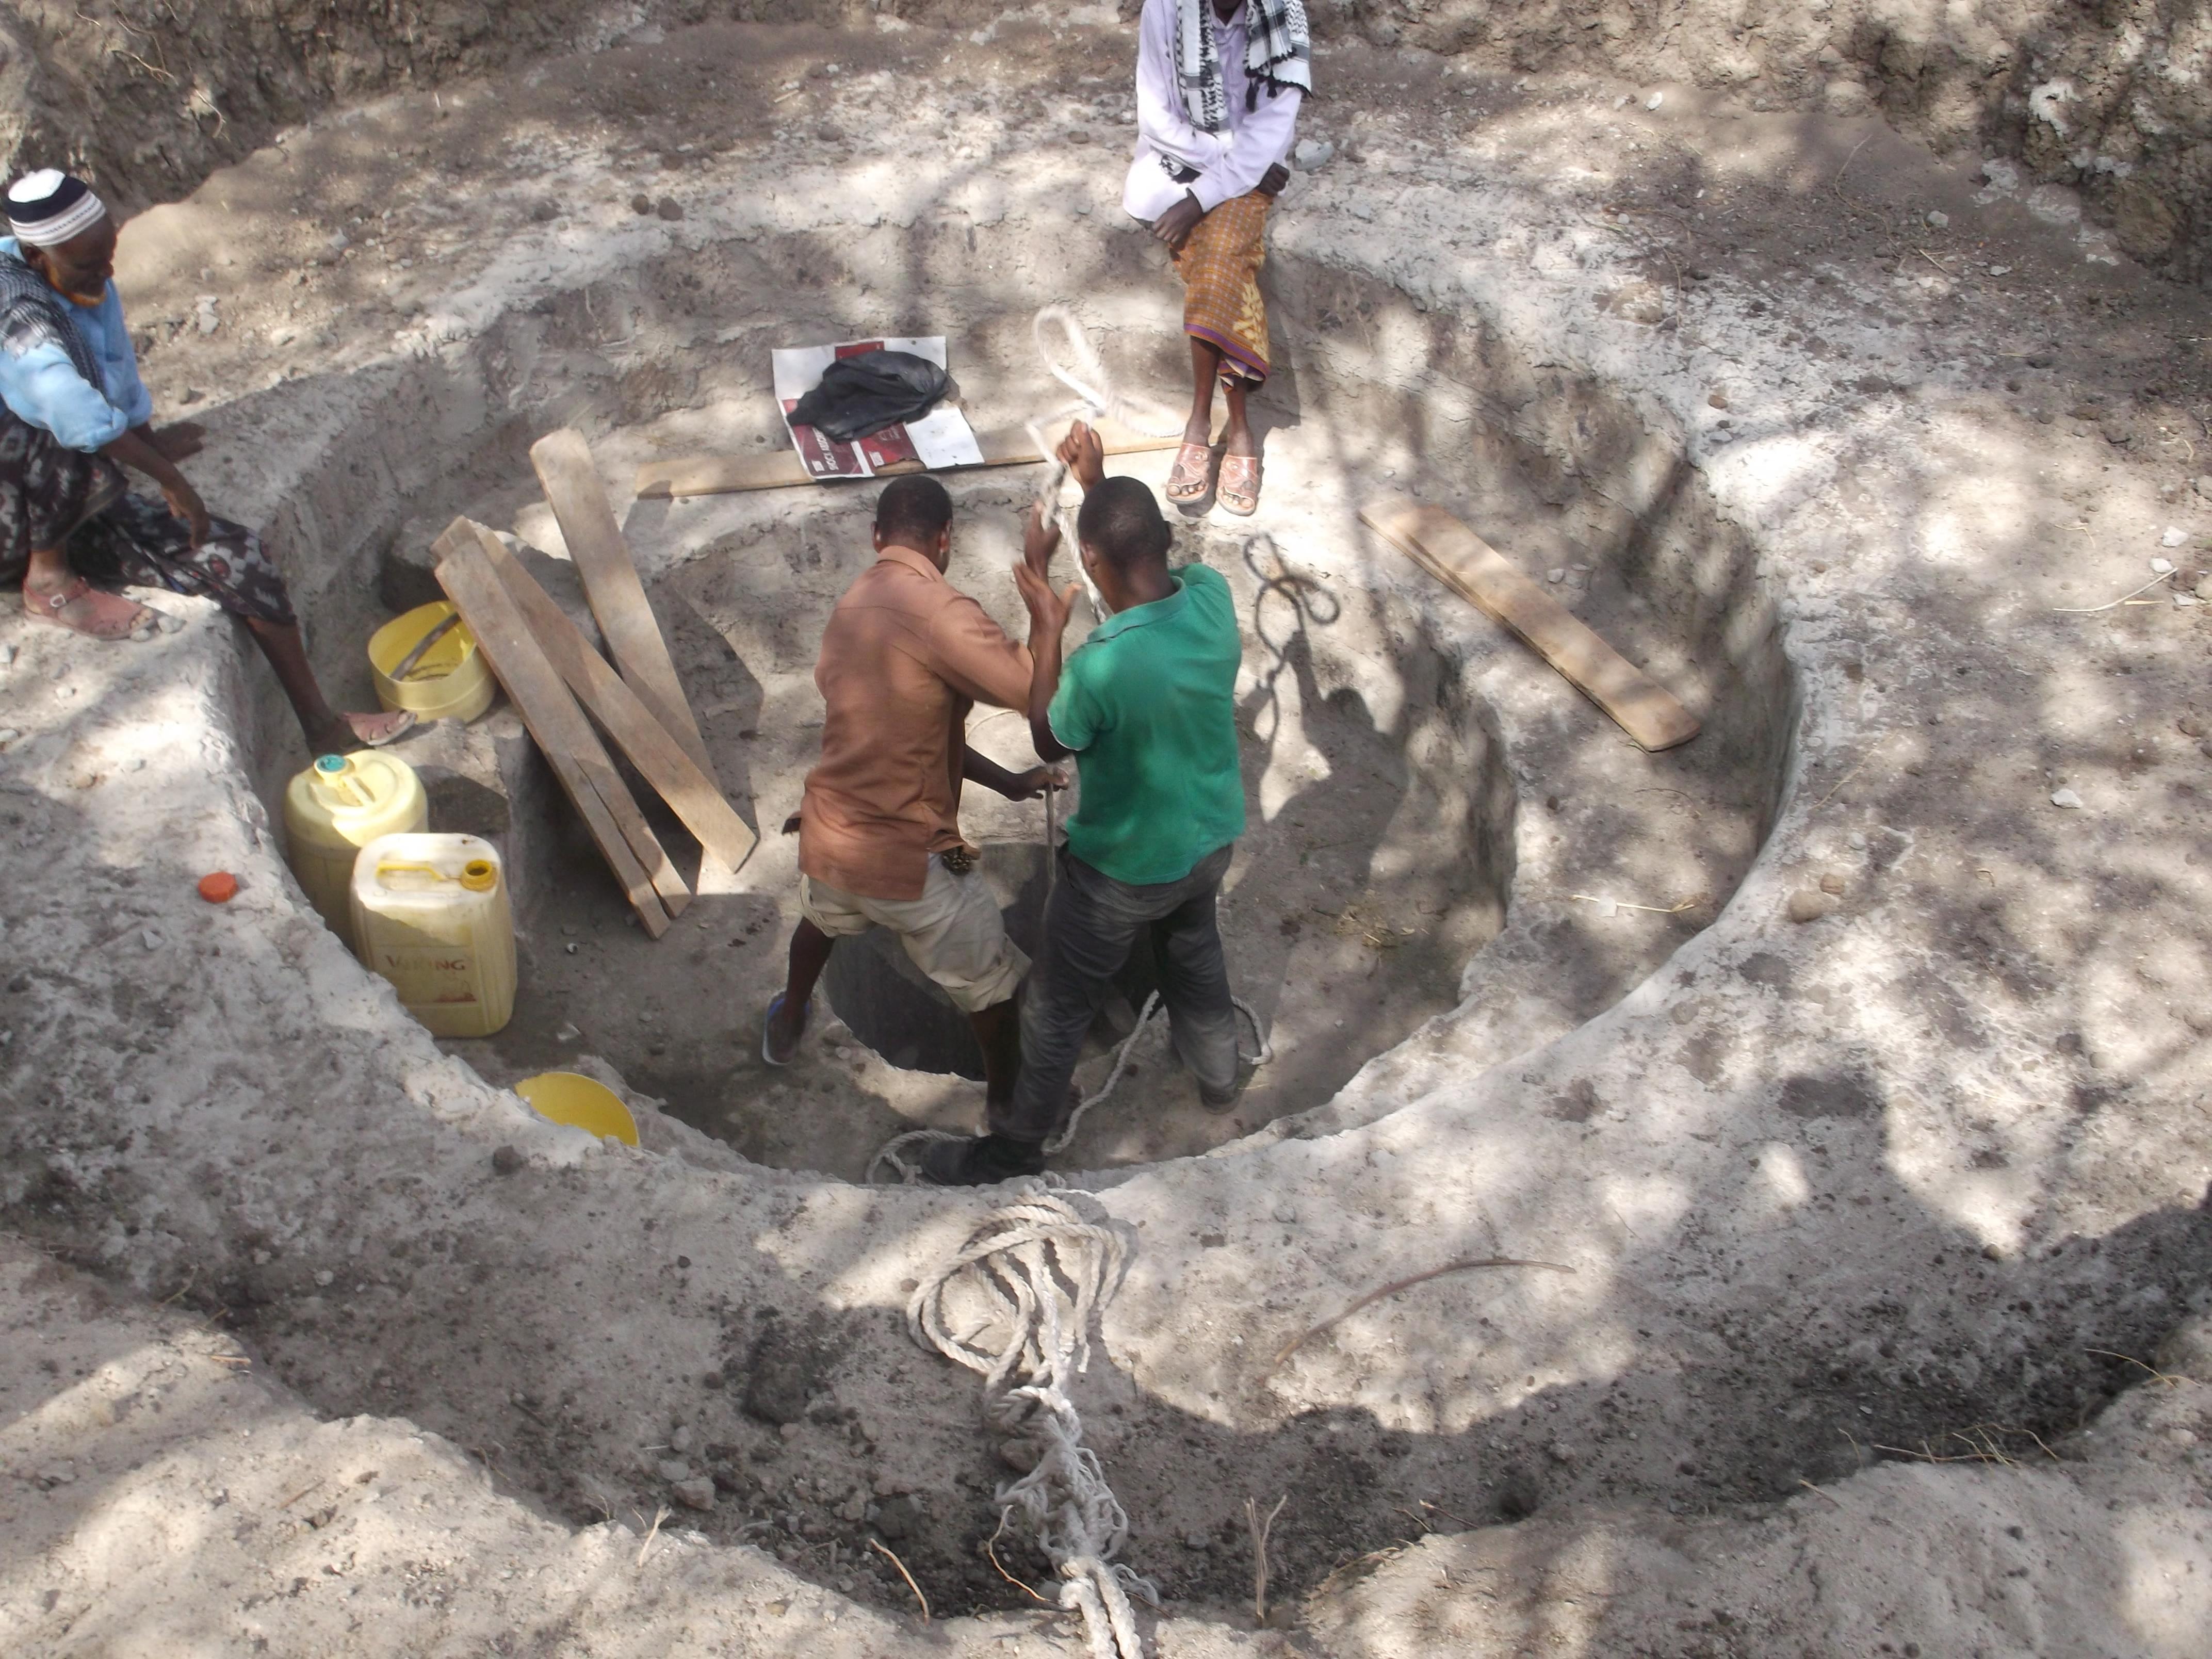 hawaye_sept 2013_ taking water